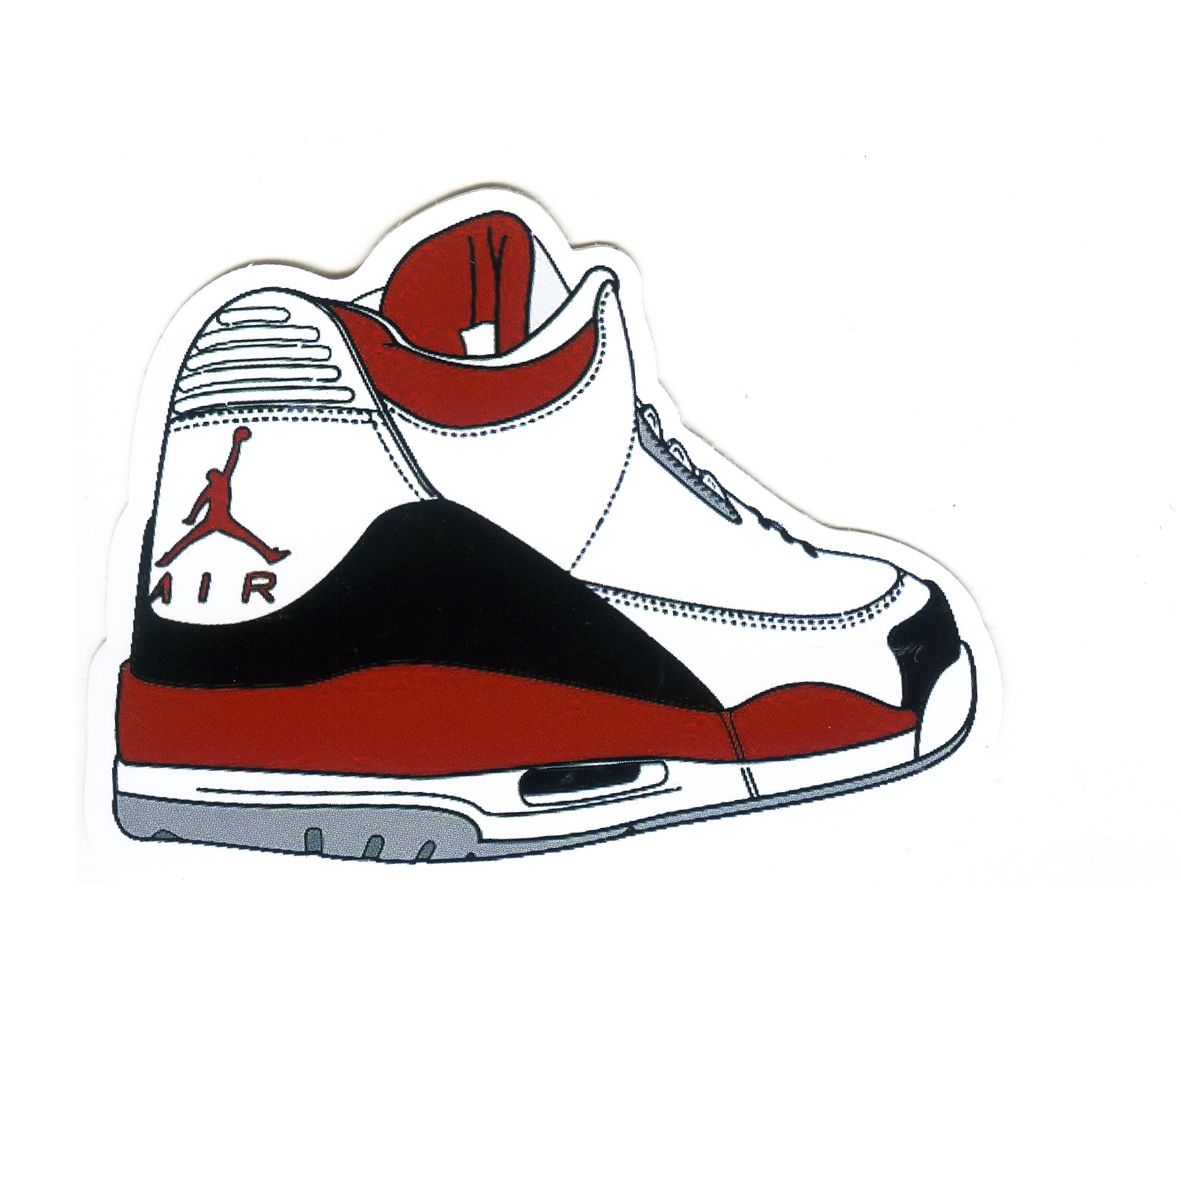 Air Jordan Drawing